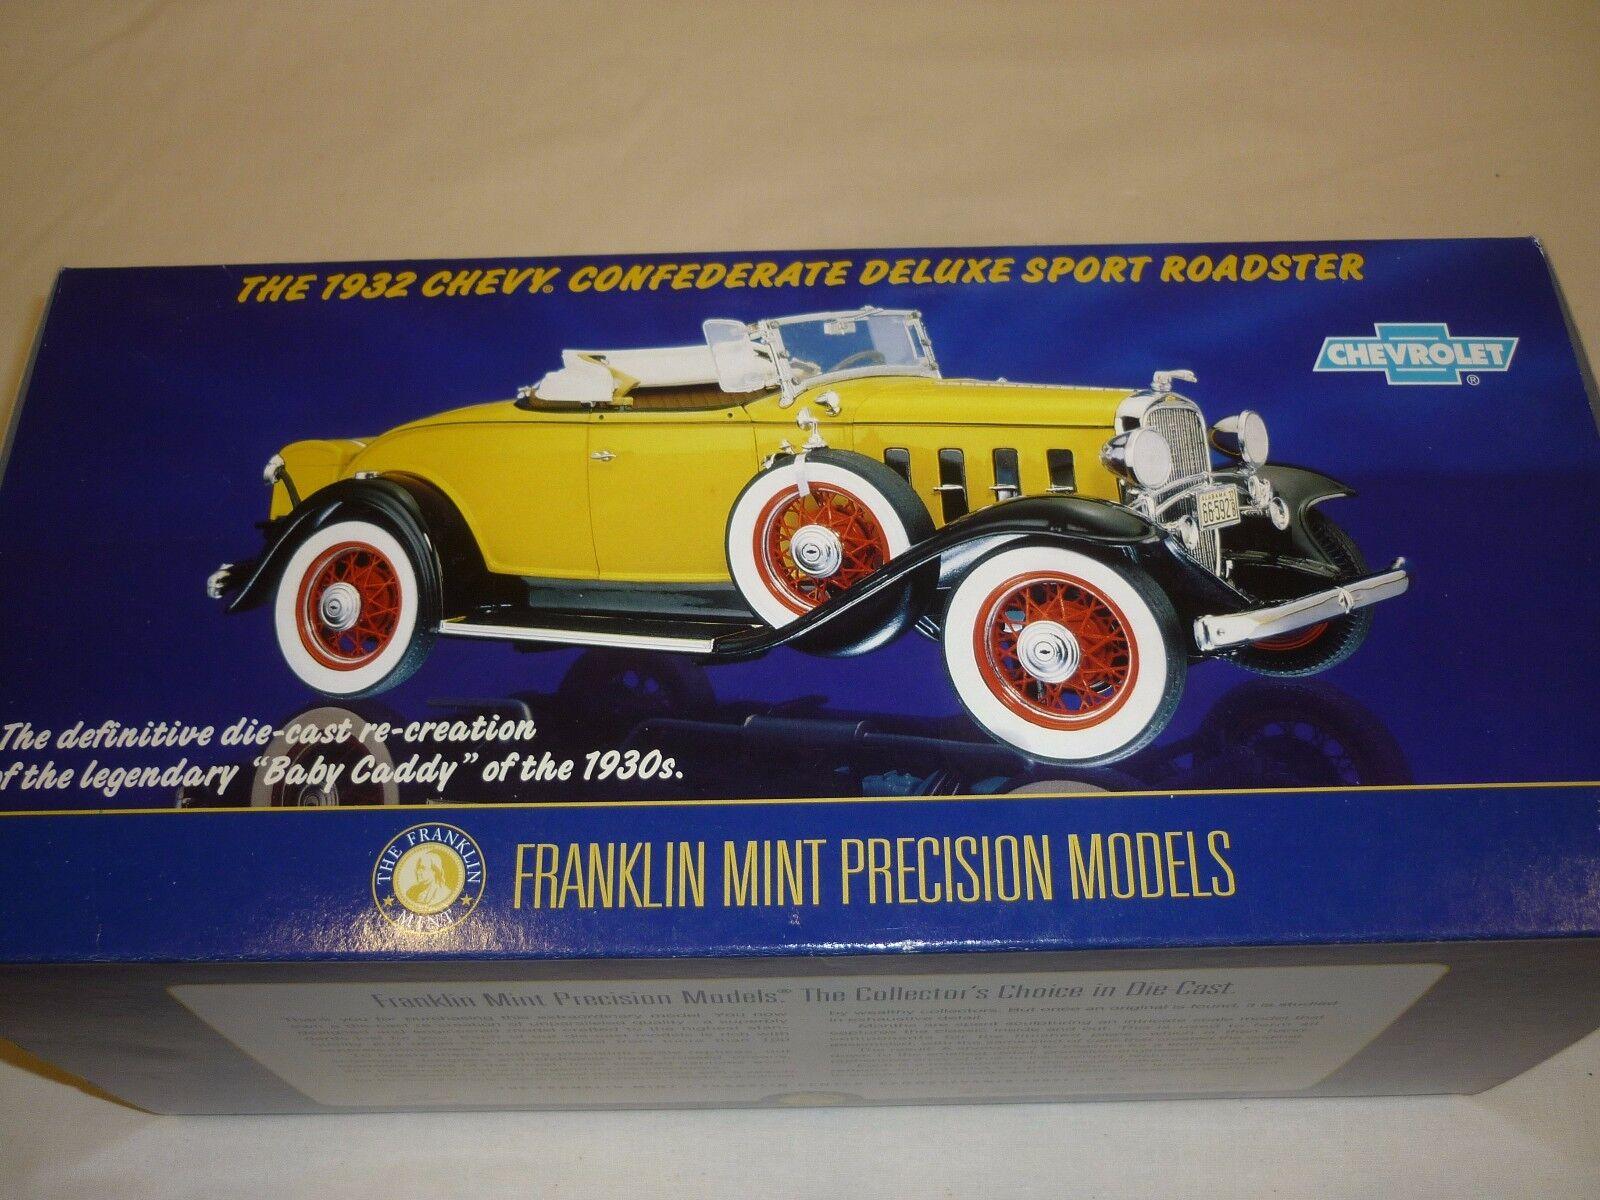 Franklin mint 1932 Chevrolet konfederation deluxe sportroaster, lådaad